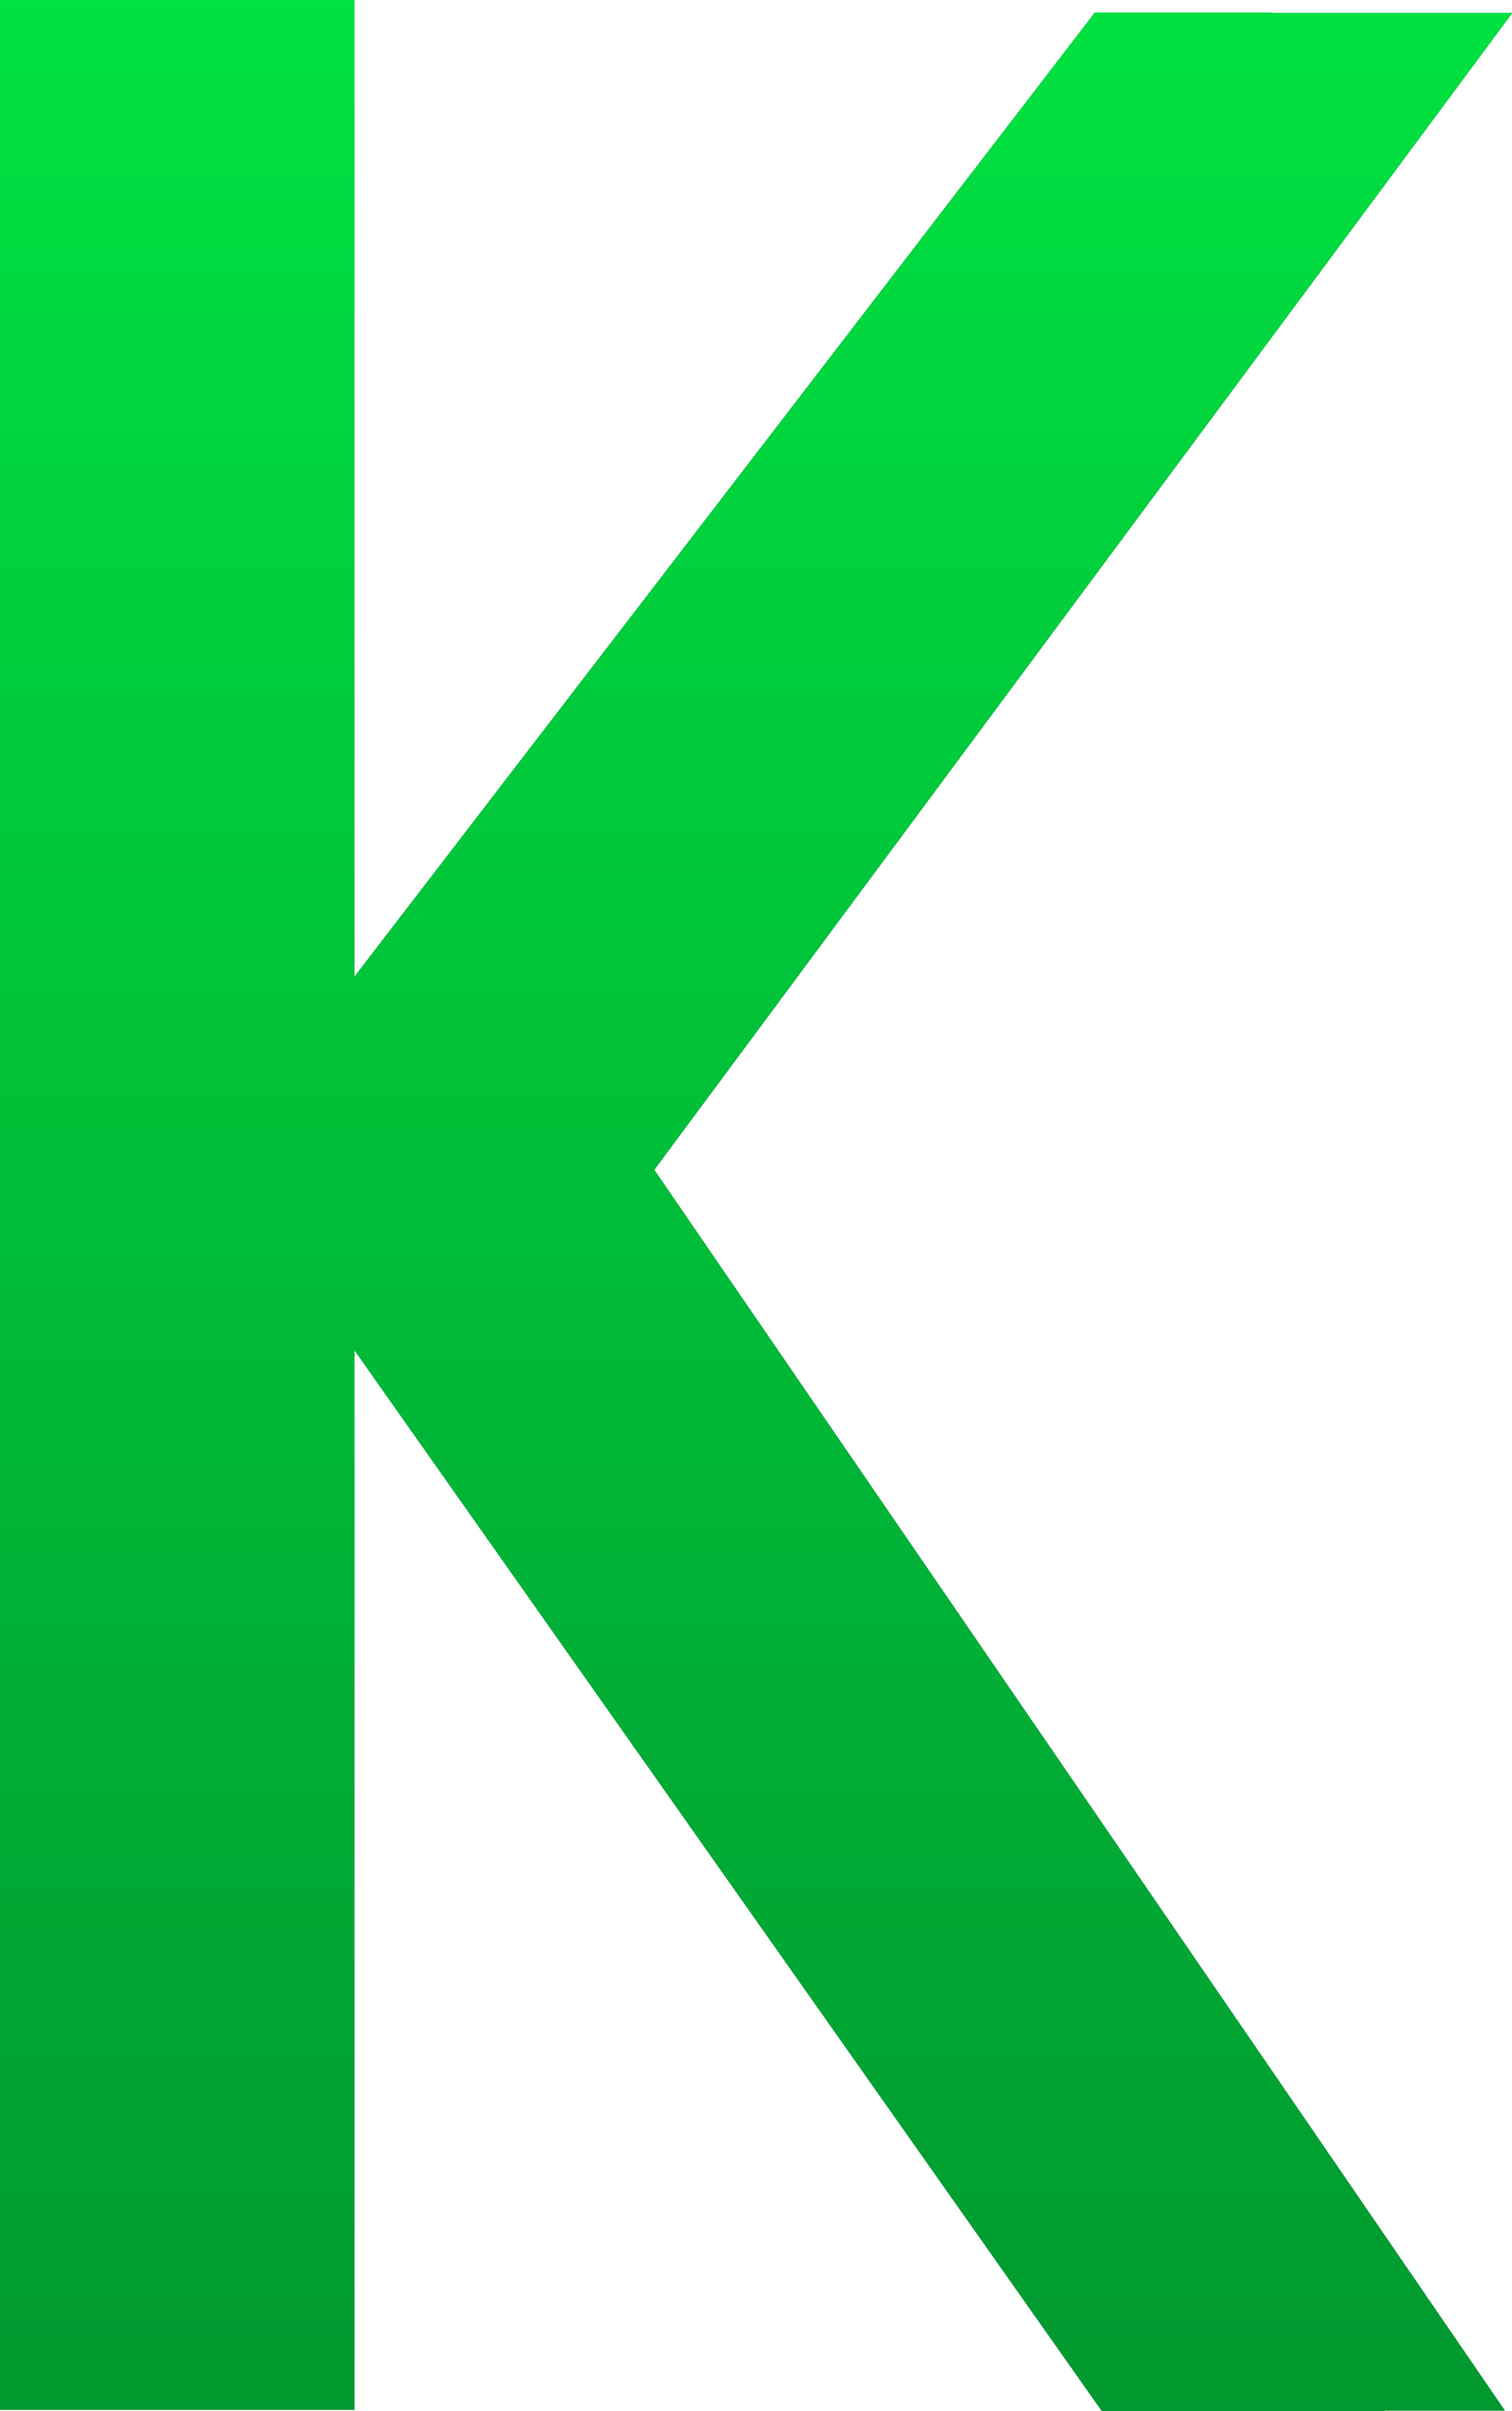 Letter K Clipart & Letter K Clip Art Images - ClipartALL.com clip art royalty free